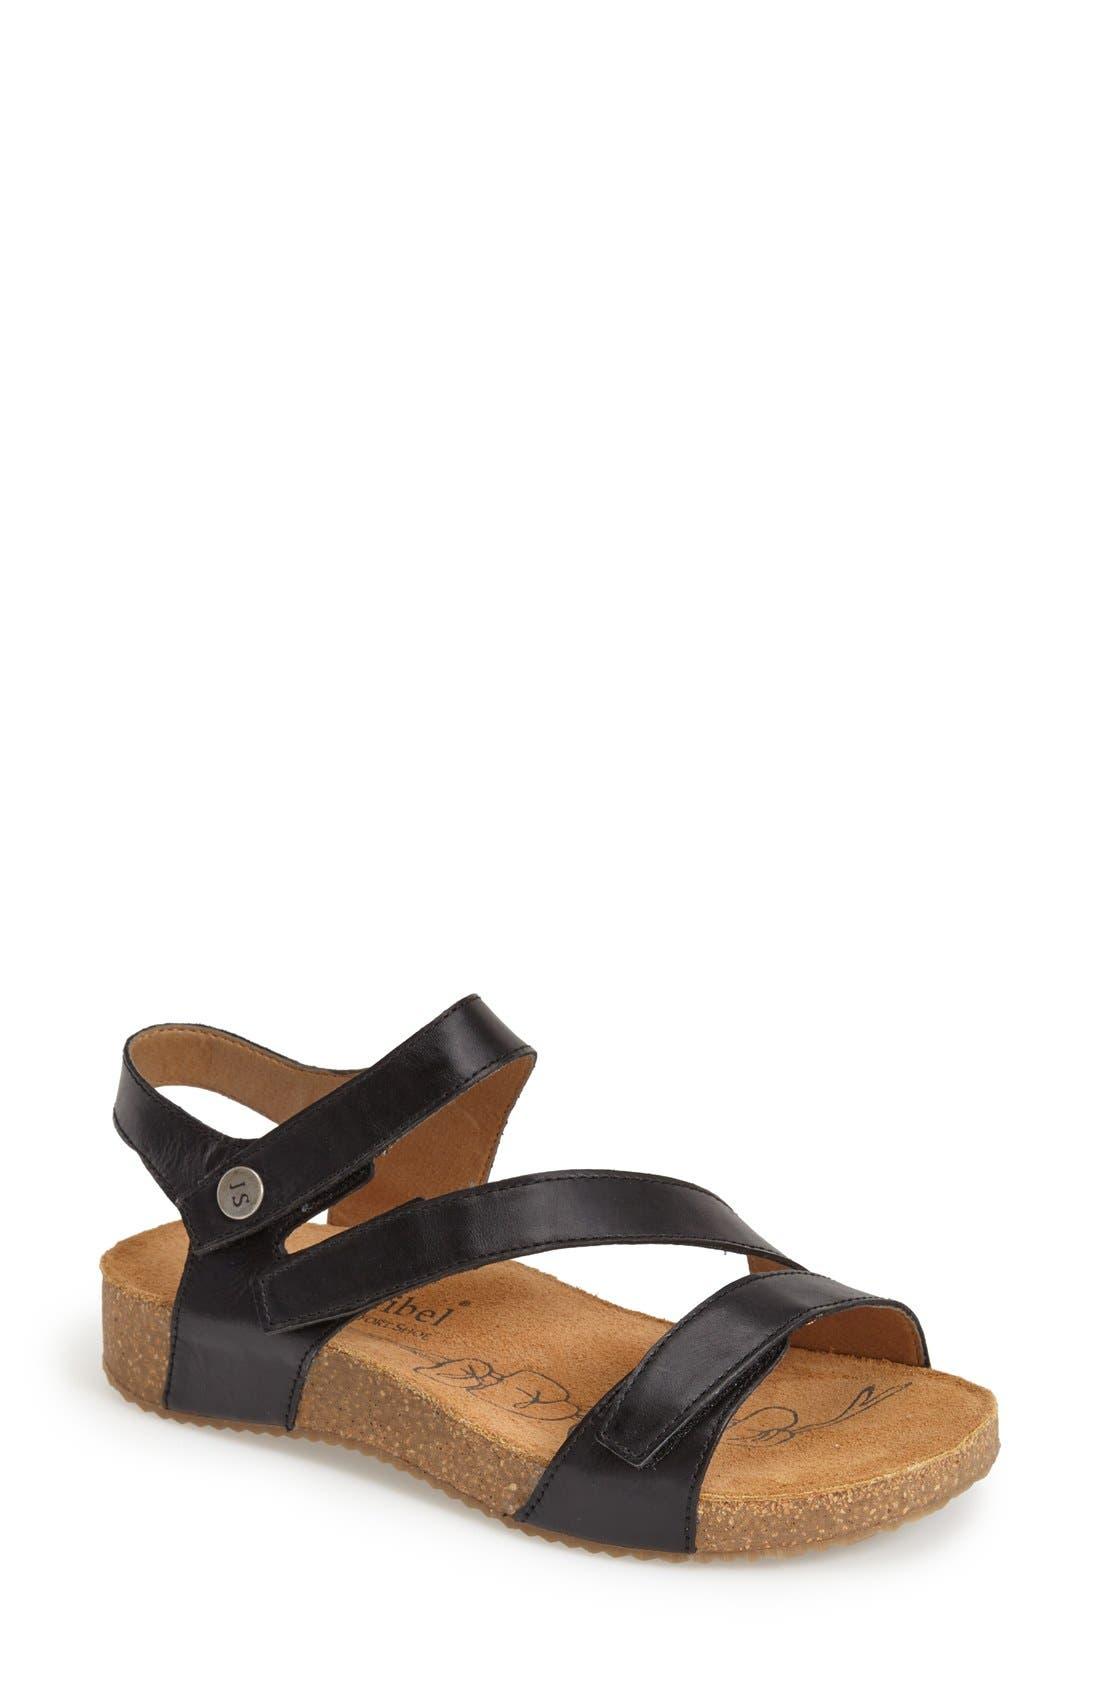 'Tonga' Leather Sandal